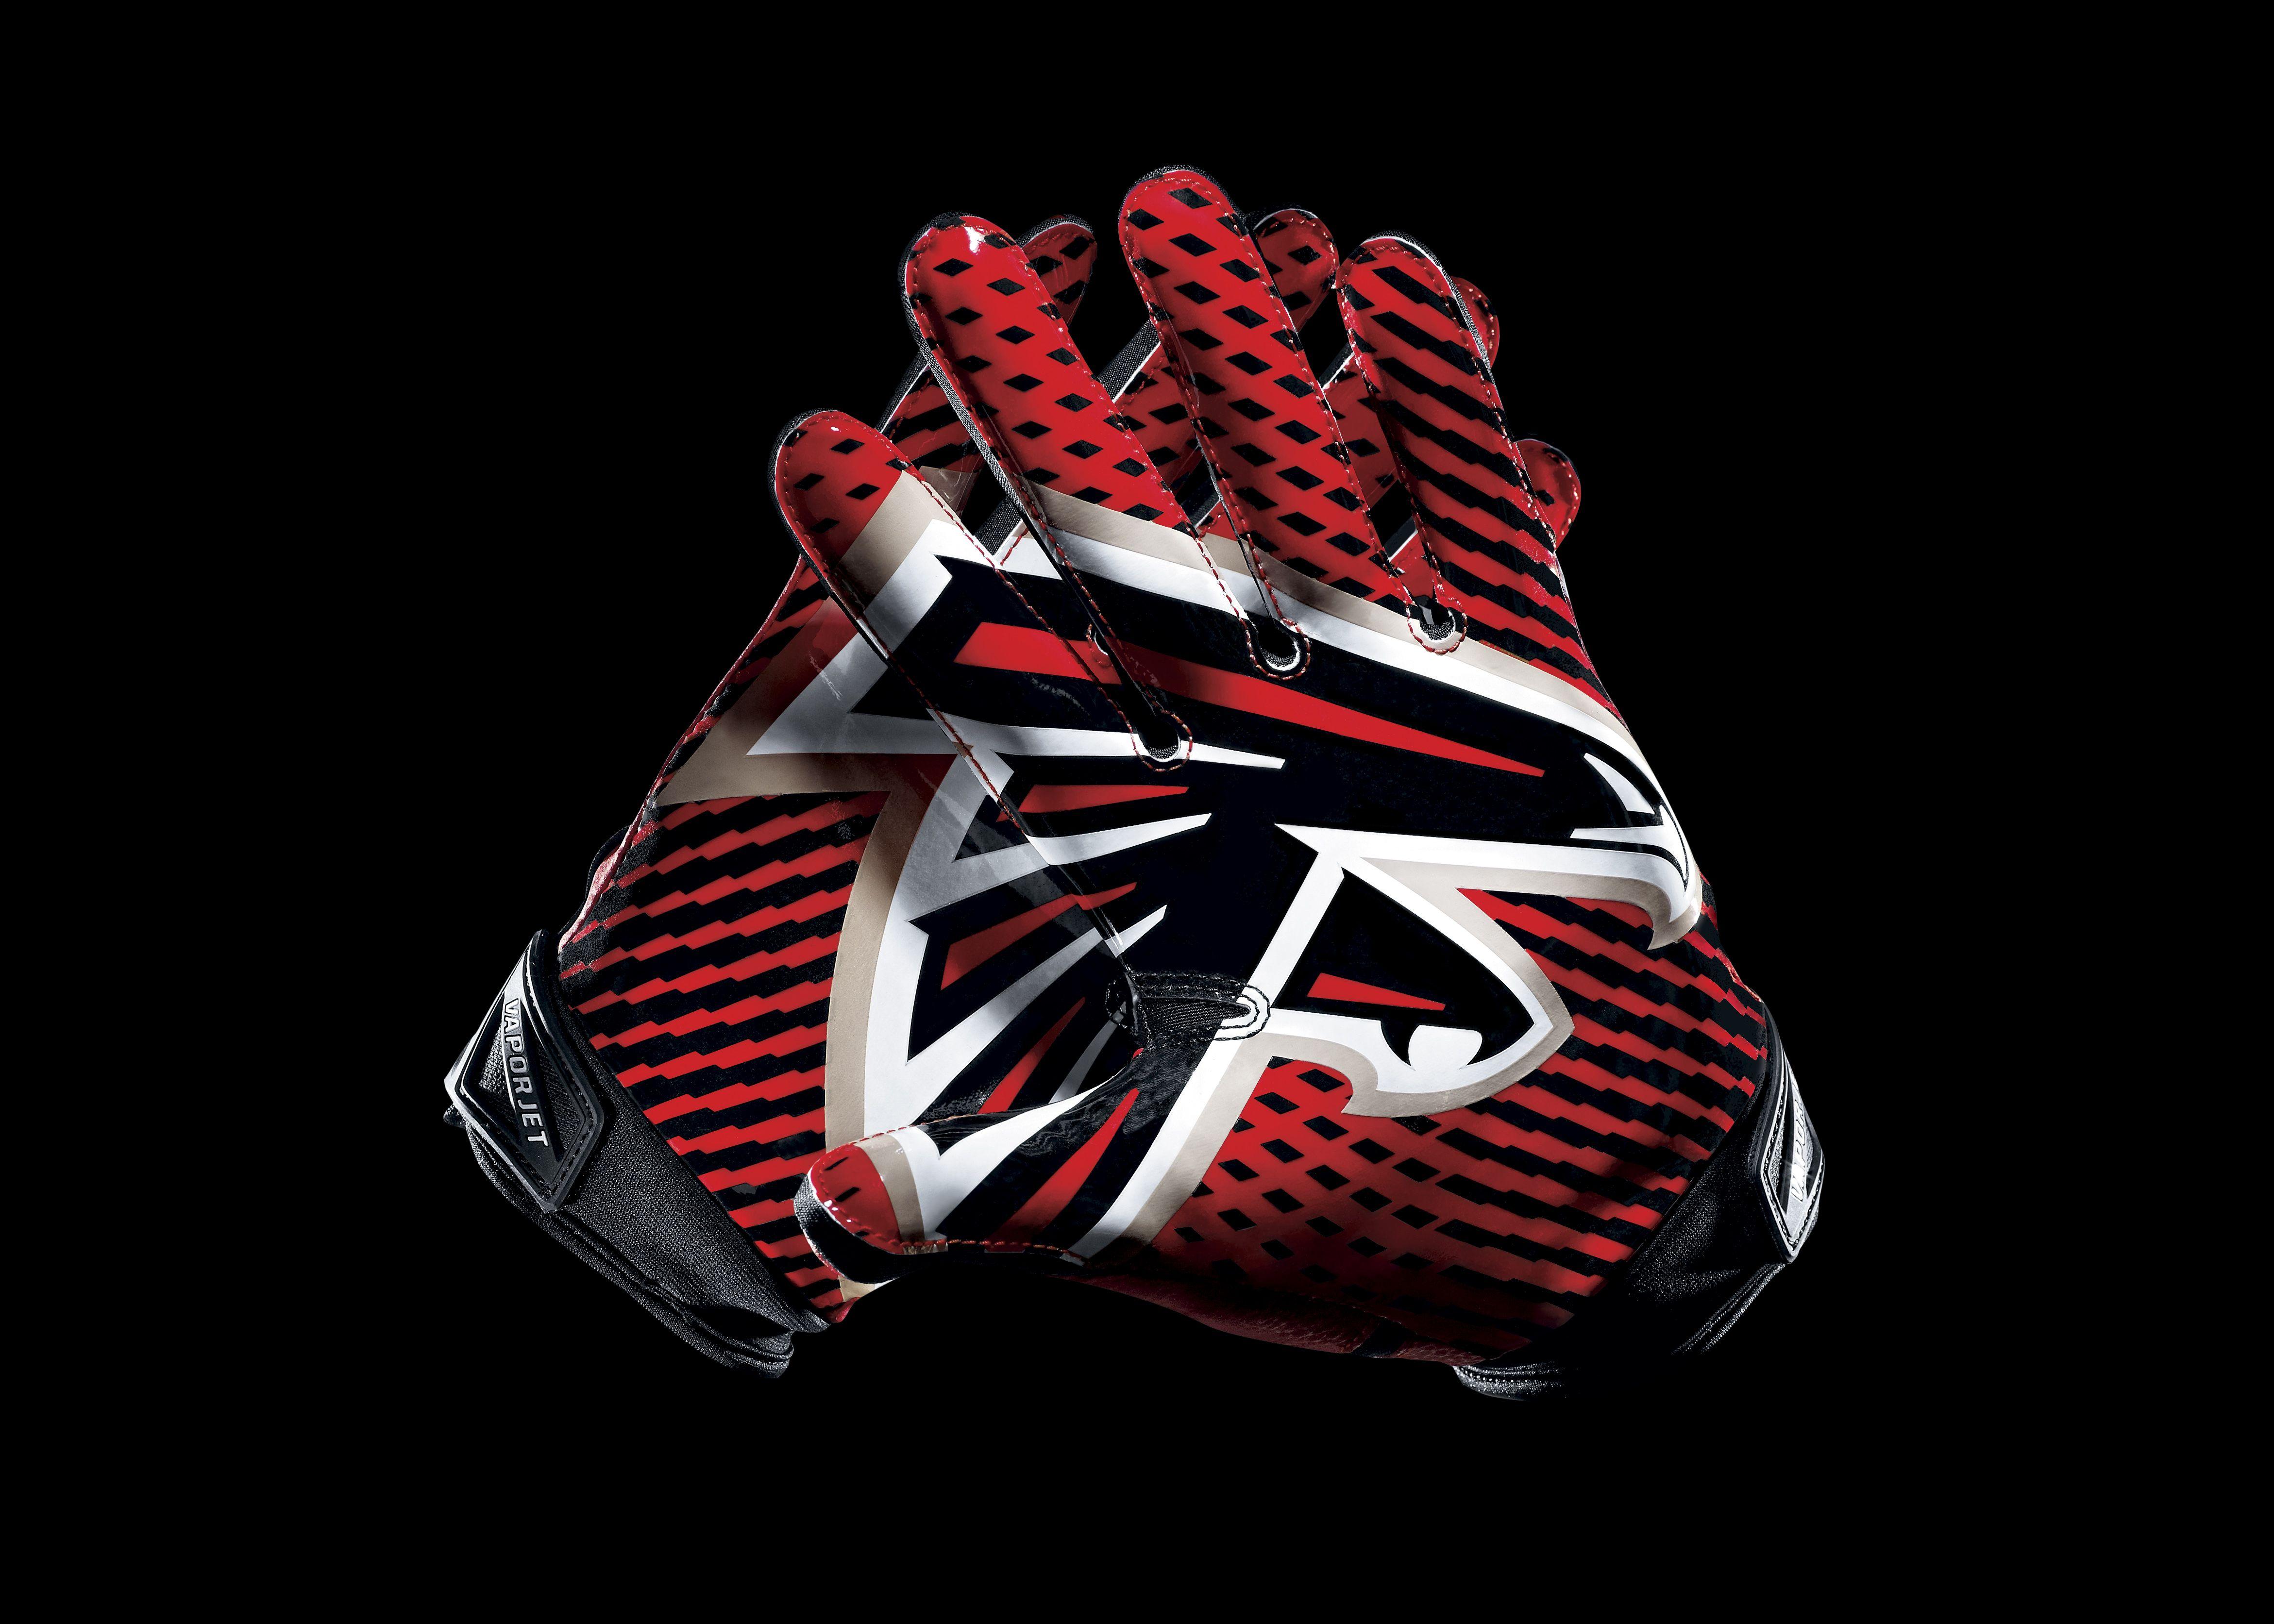 Atlanta Falcons Wallpaper For Pc Full Hd Pictures Atlanta Falcons Football Atlanta Falcons Atlanta Falcons Wallpaper